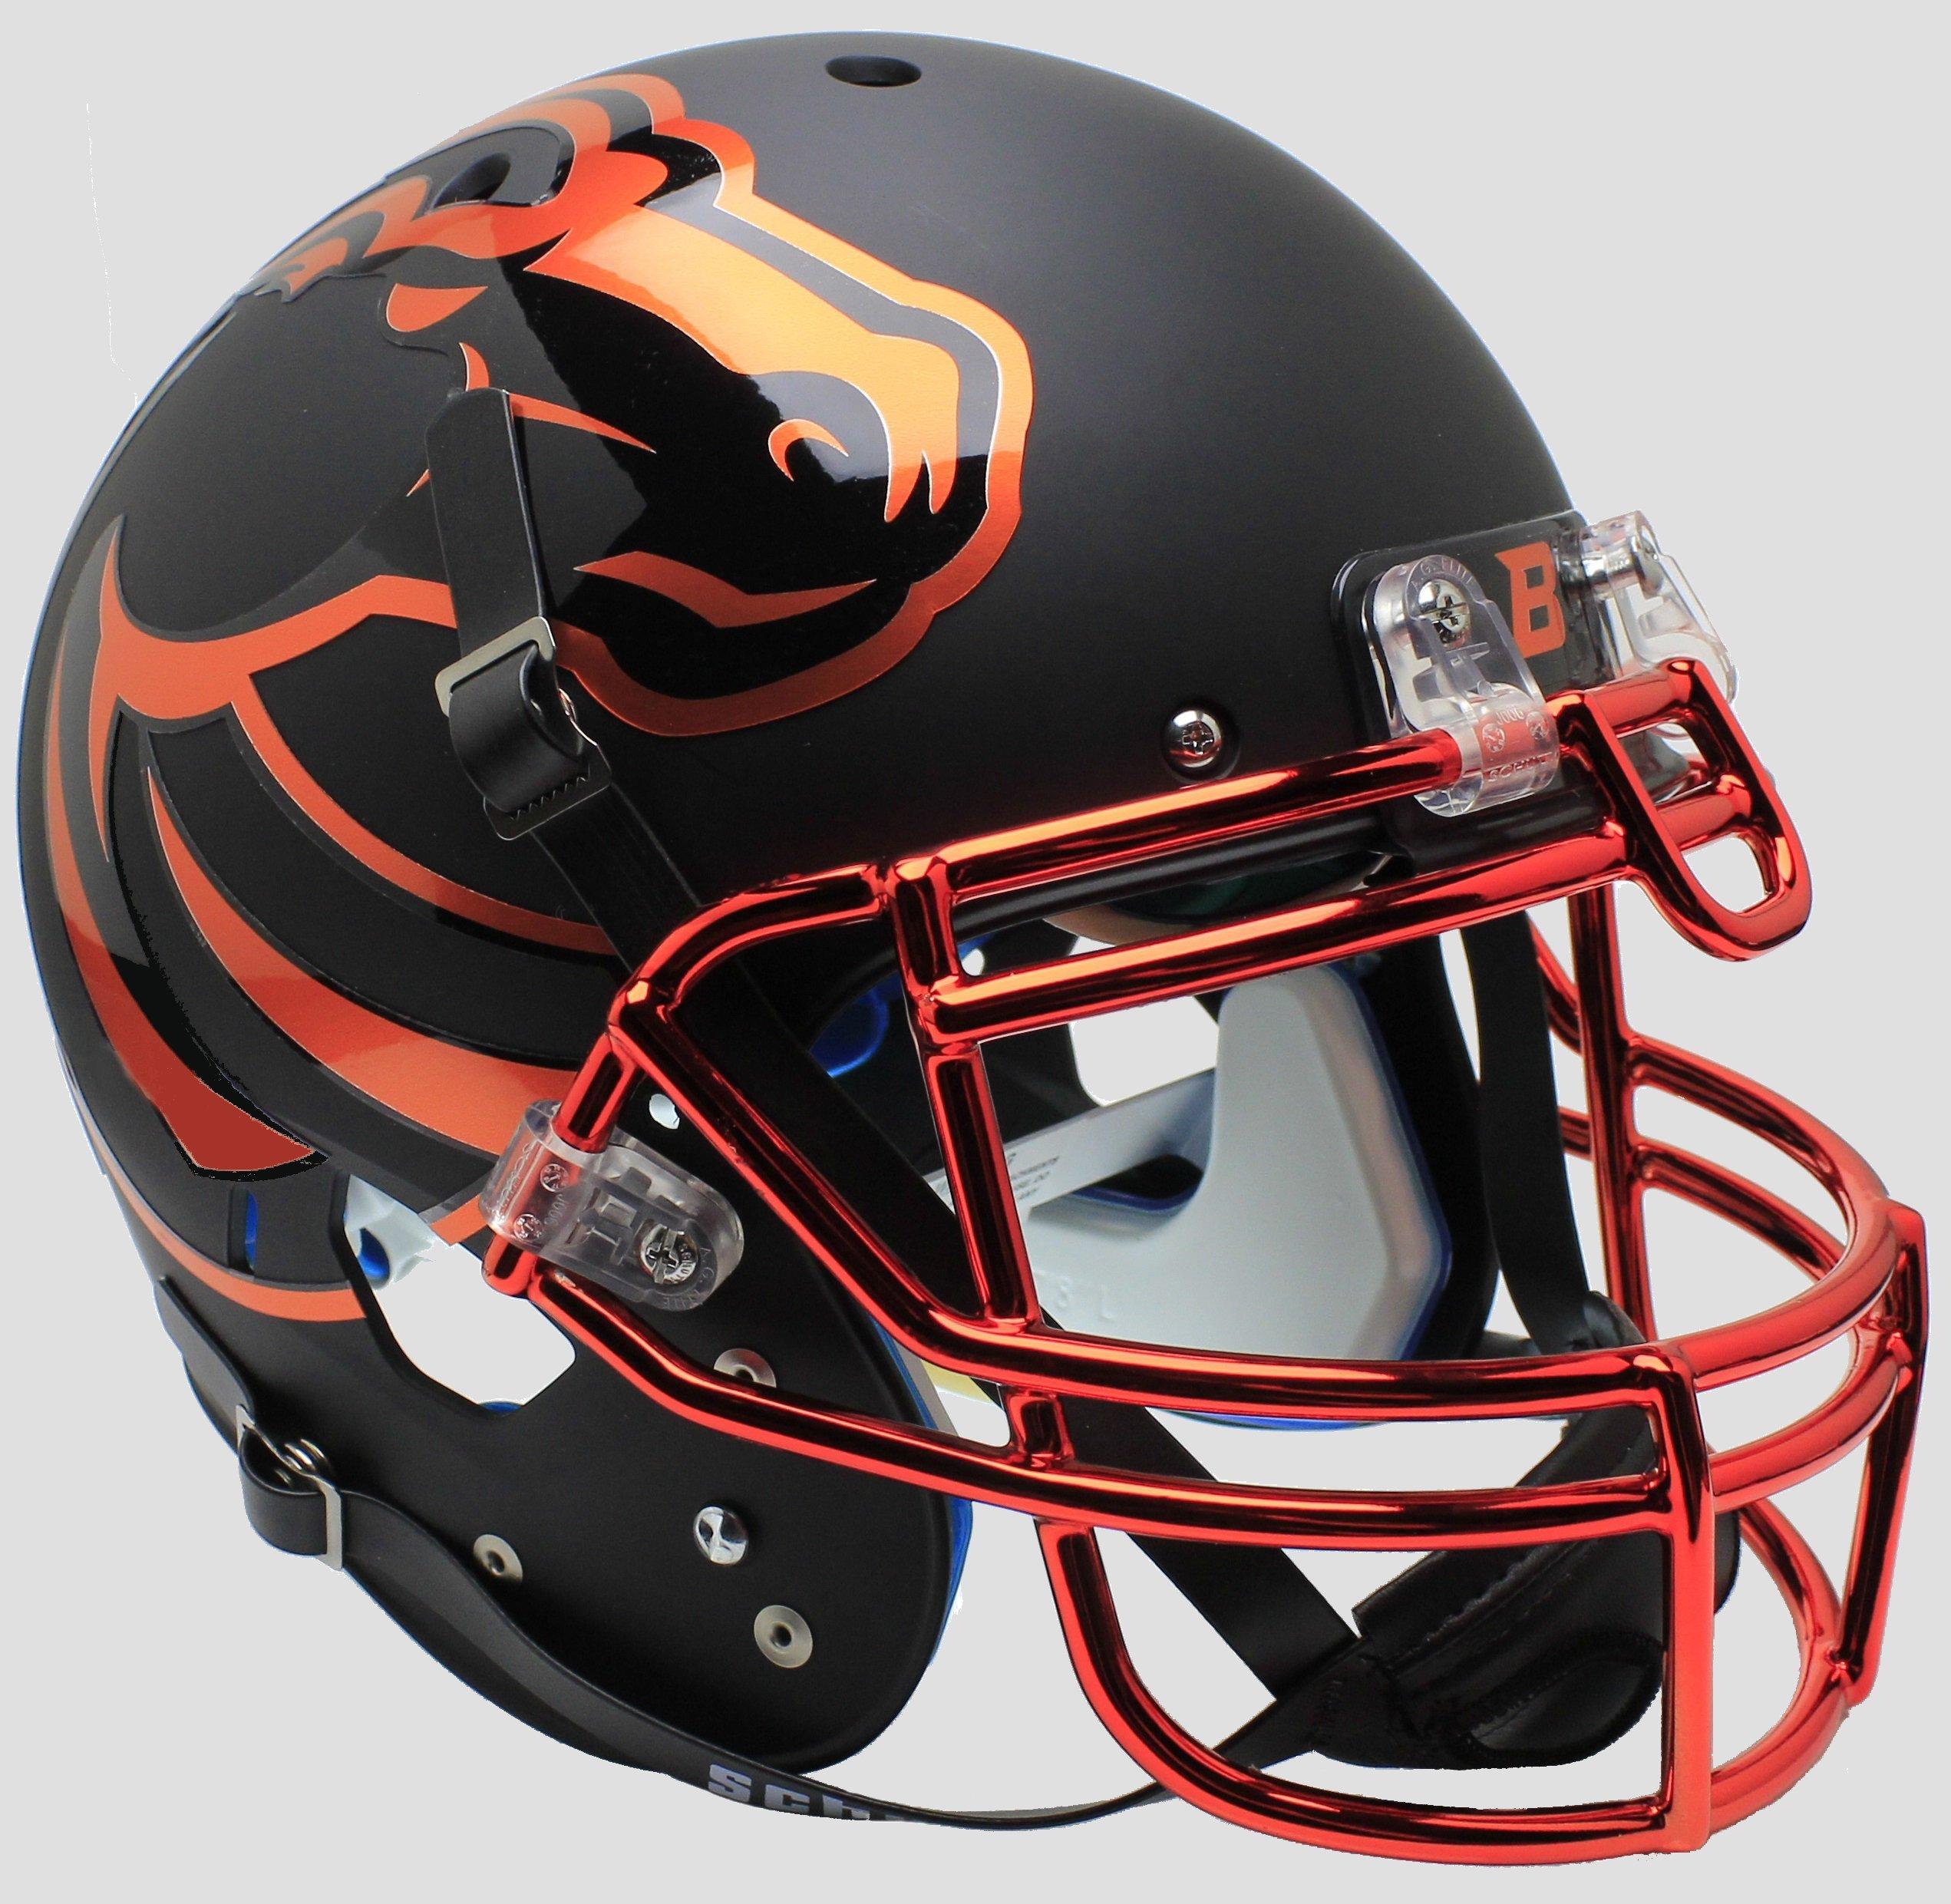 Schutt NCAA Boise State Broncos On-Field Authentic XP Football Helmet, Halloween Alt. 7 by Schutt (Image #1)